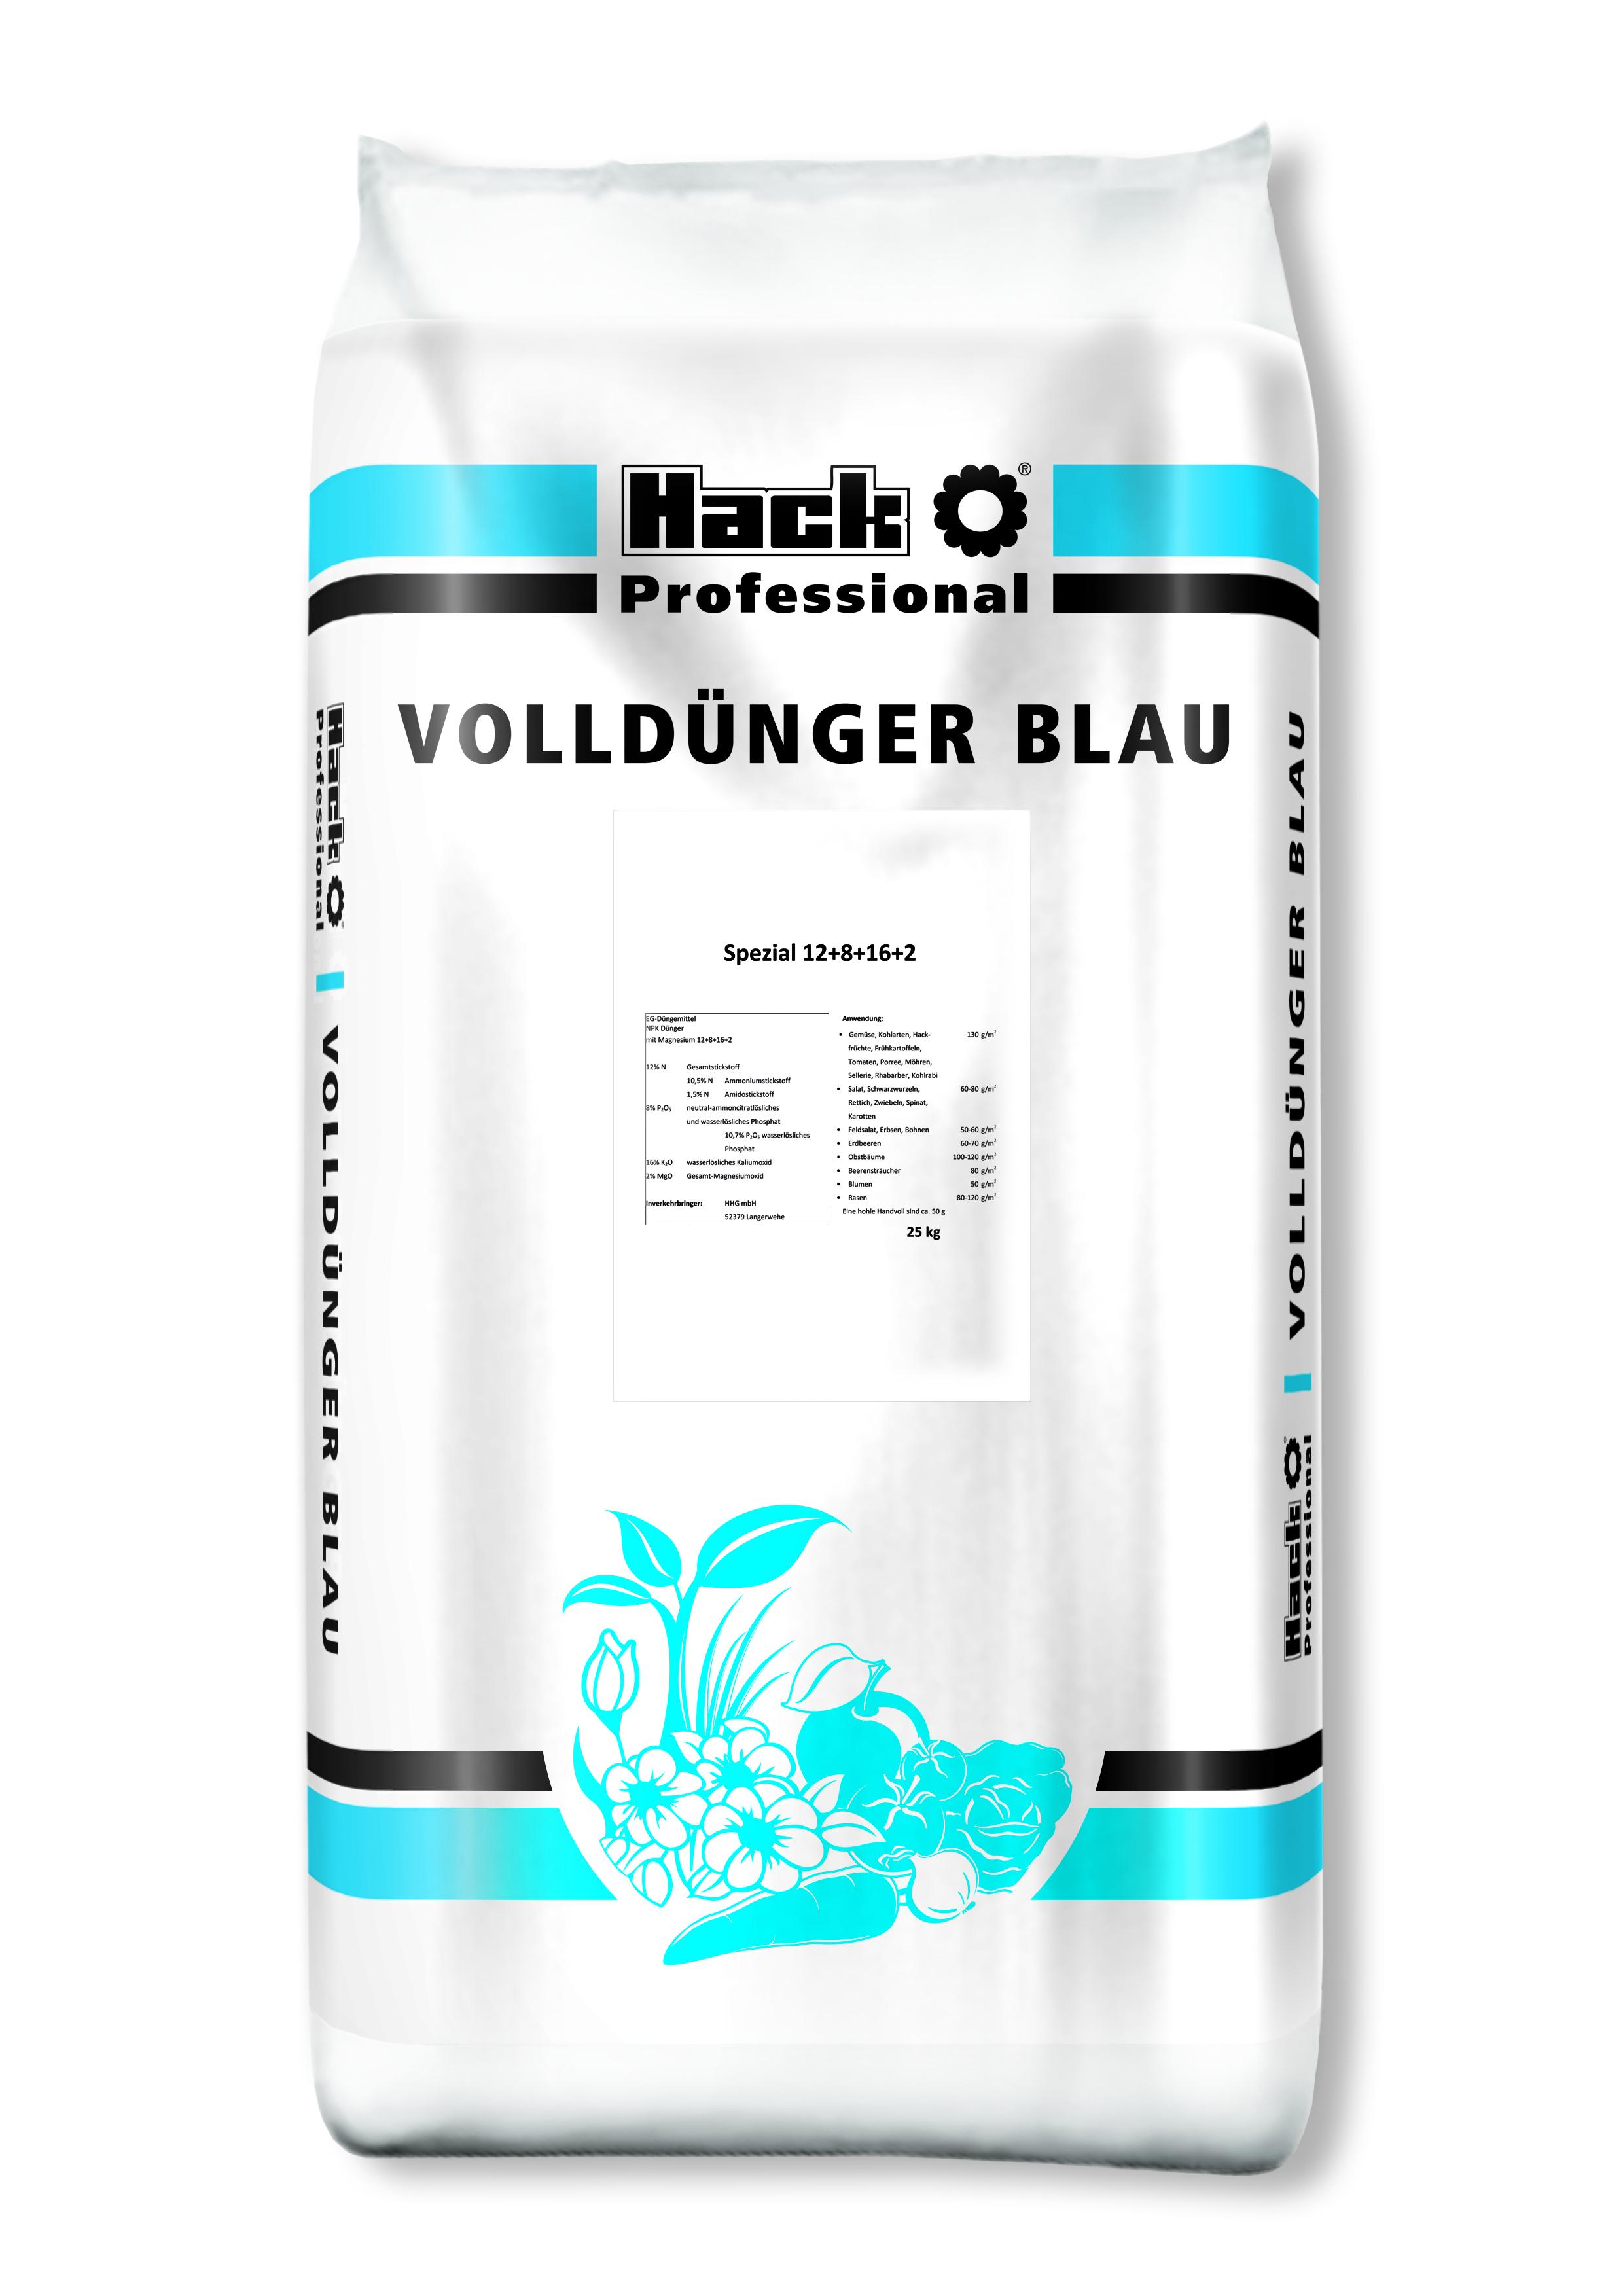 Hack Profi Volldünger Blau  Spezial Blau-Dünger NPK 12+8+16 +2   25 kg